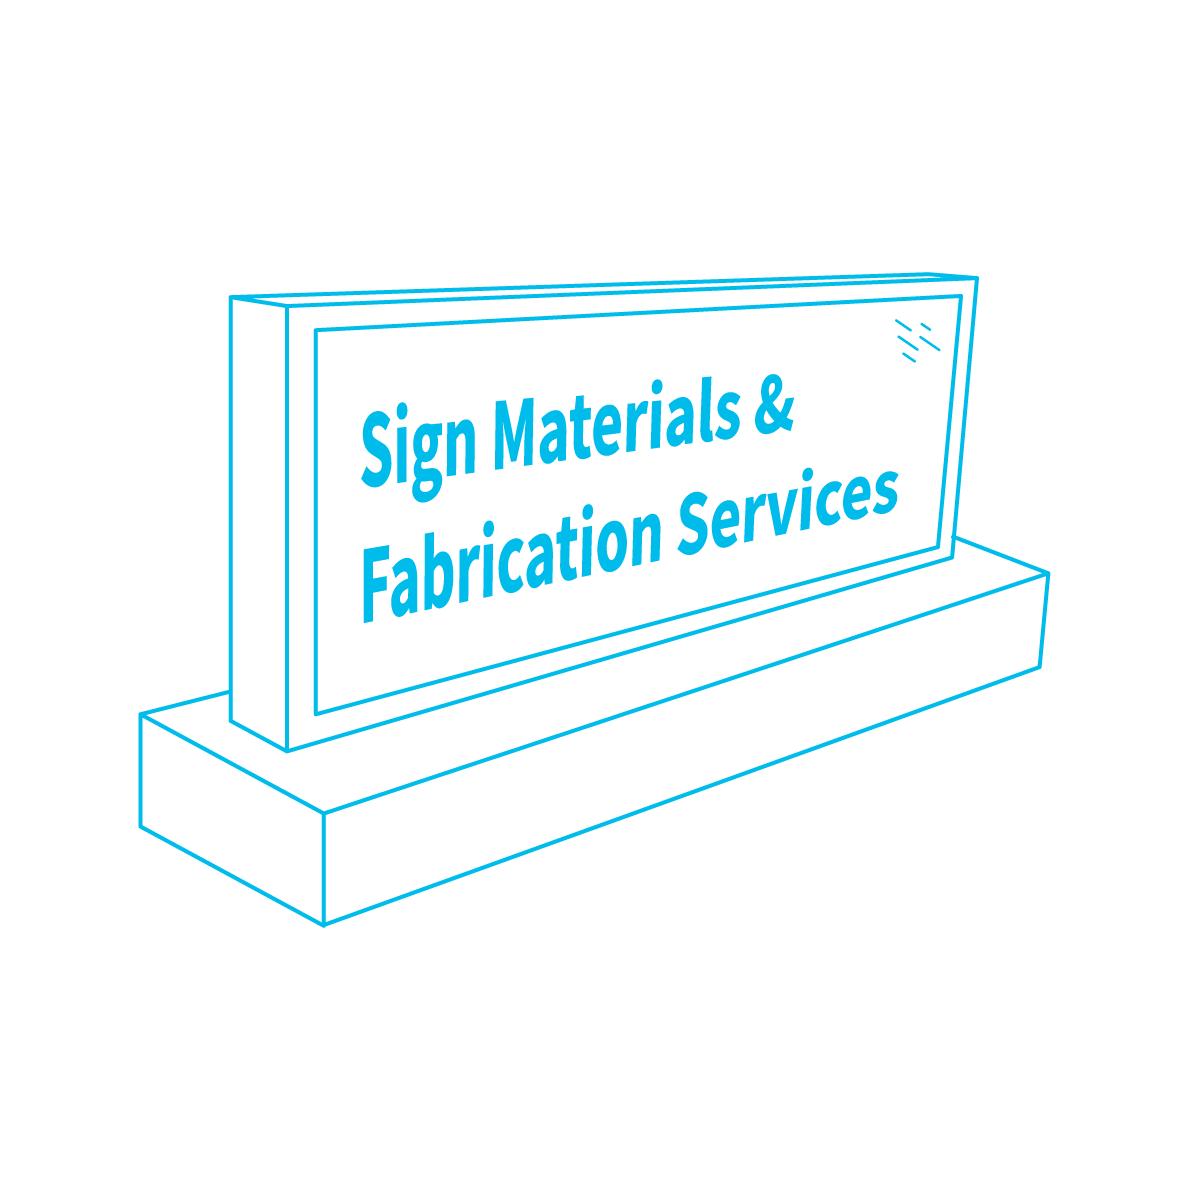 Lustercraft Plastics Sign Fabrication and Supplies